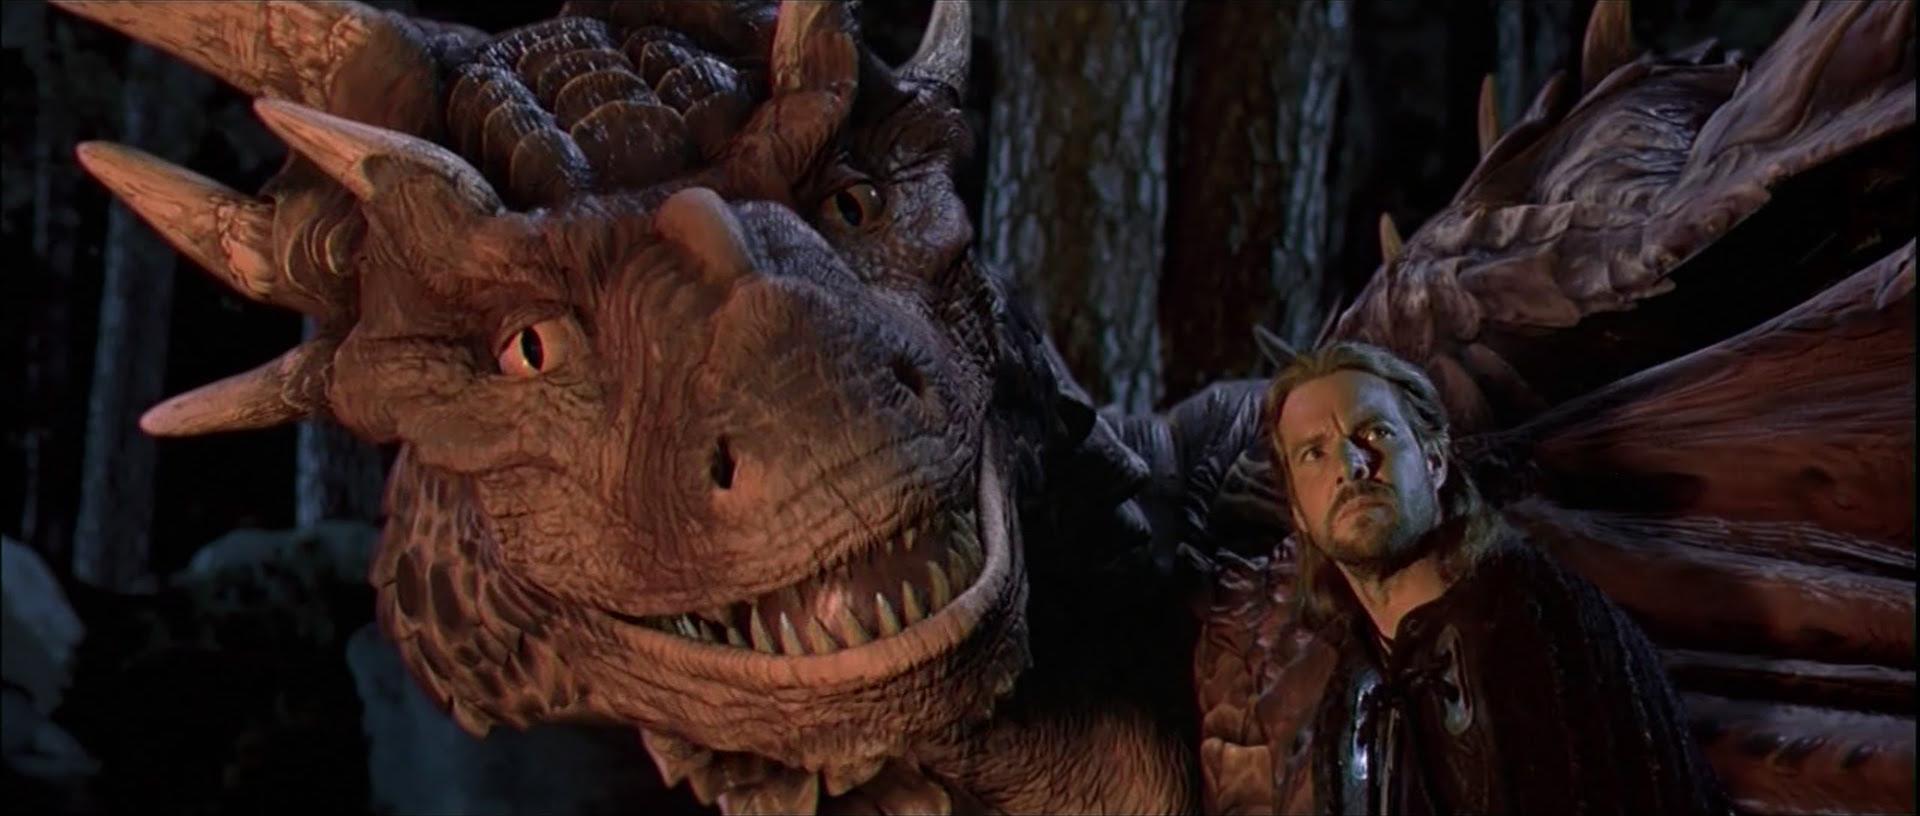 BioWare is developing a new Dragon Age screenshot